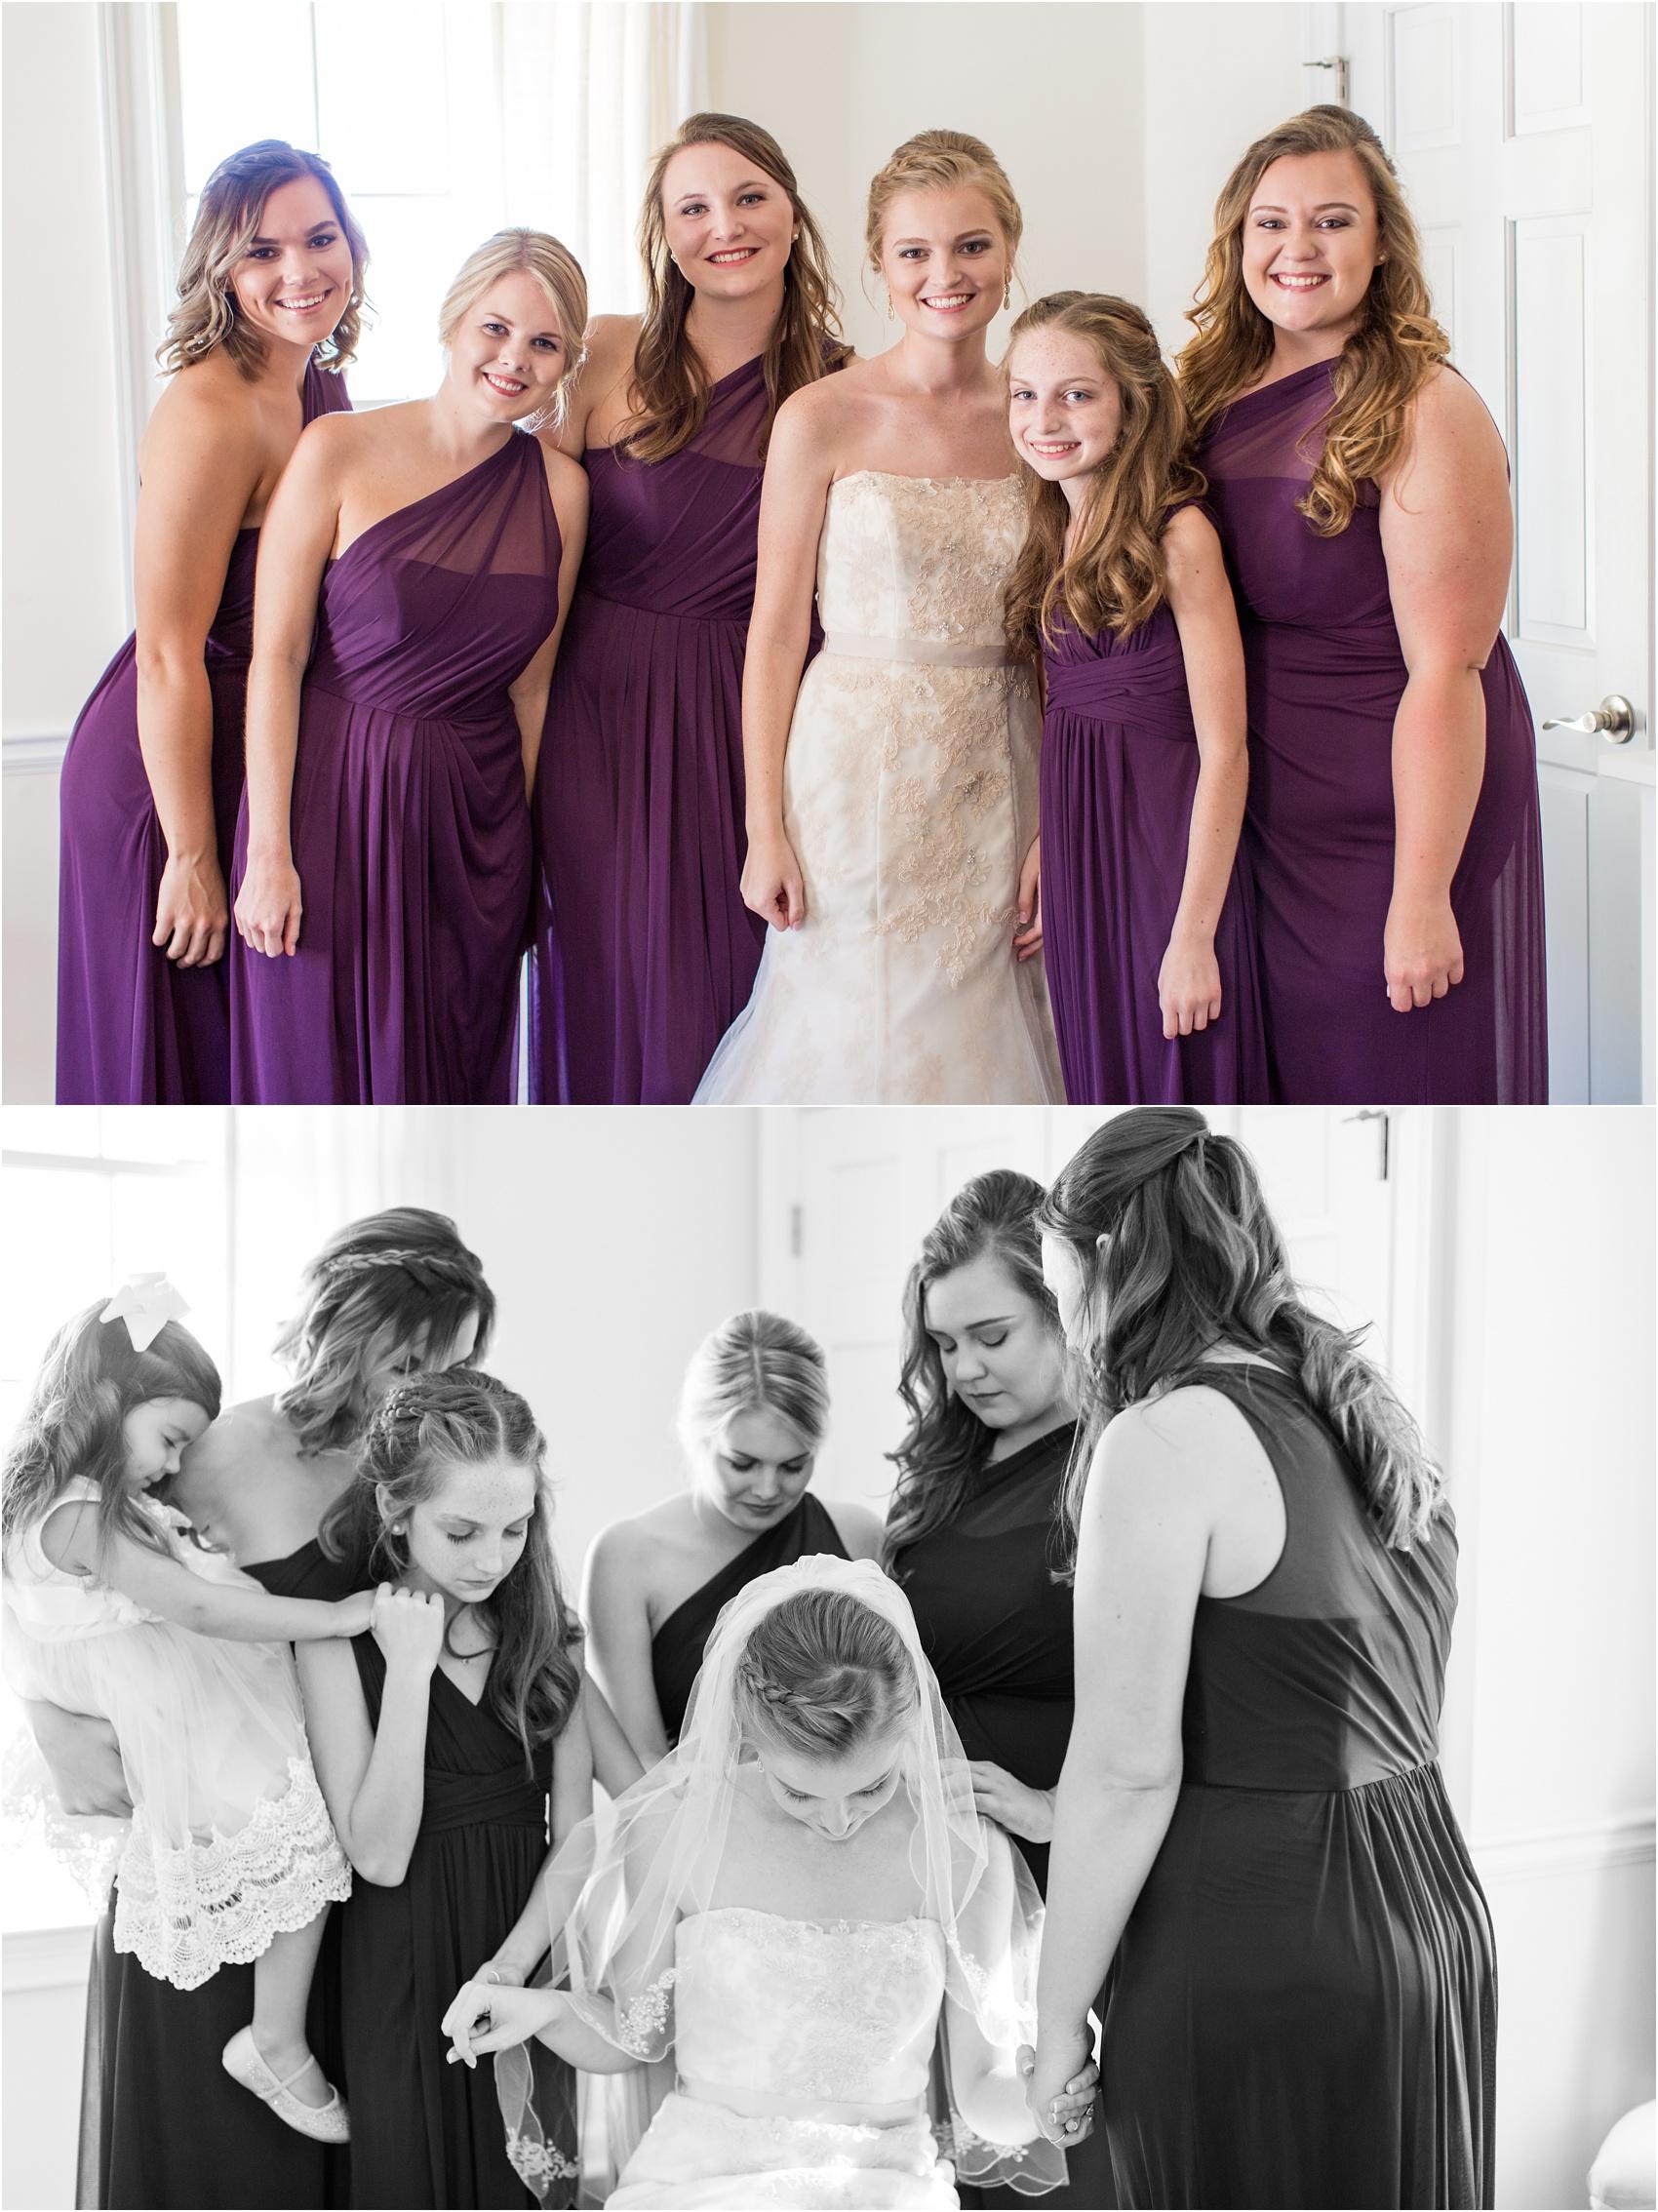 Savannah Eve Photography- Perkins Wedding- Blog-7.jpg